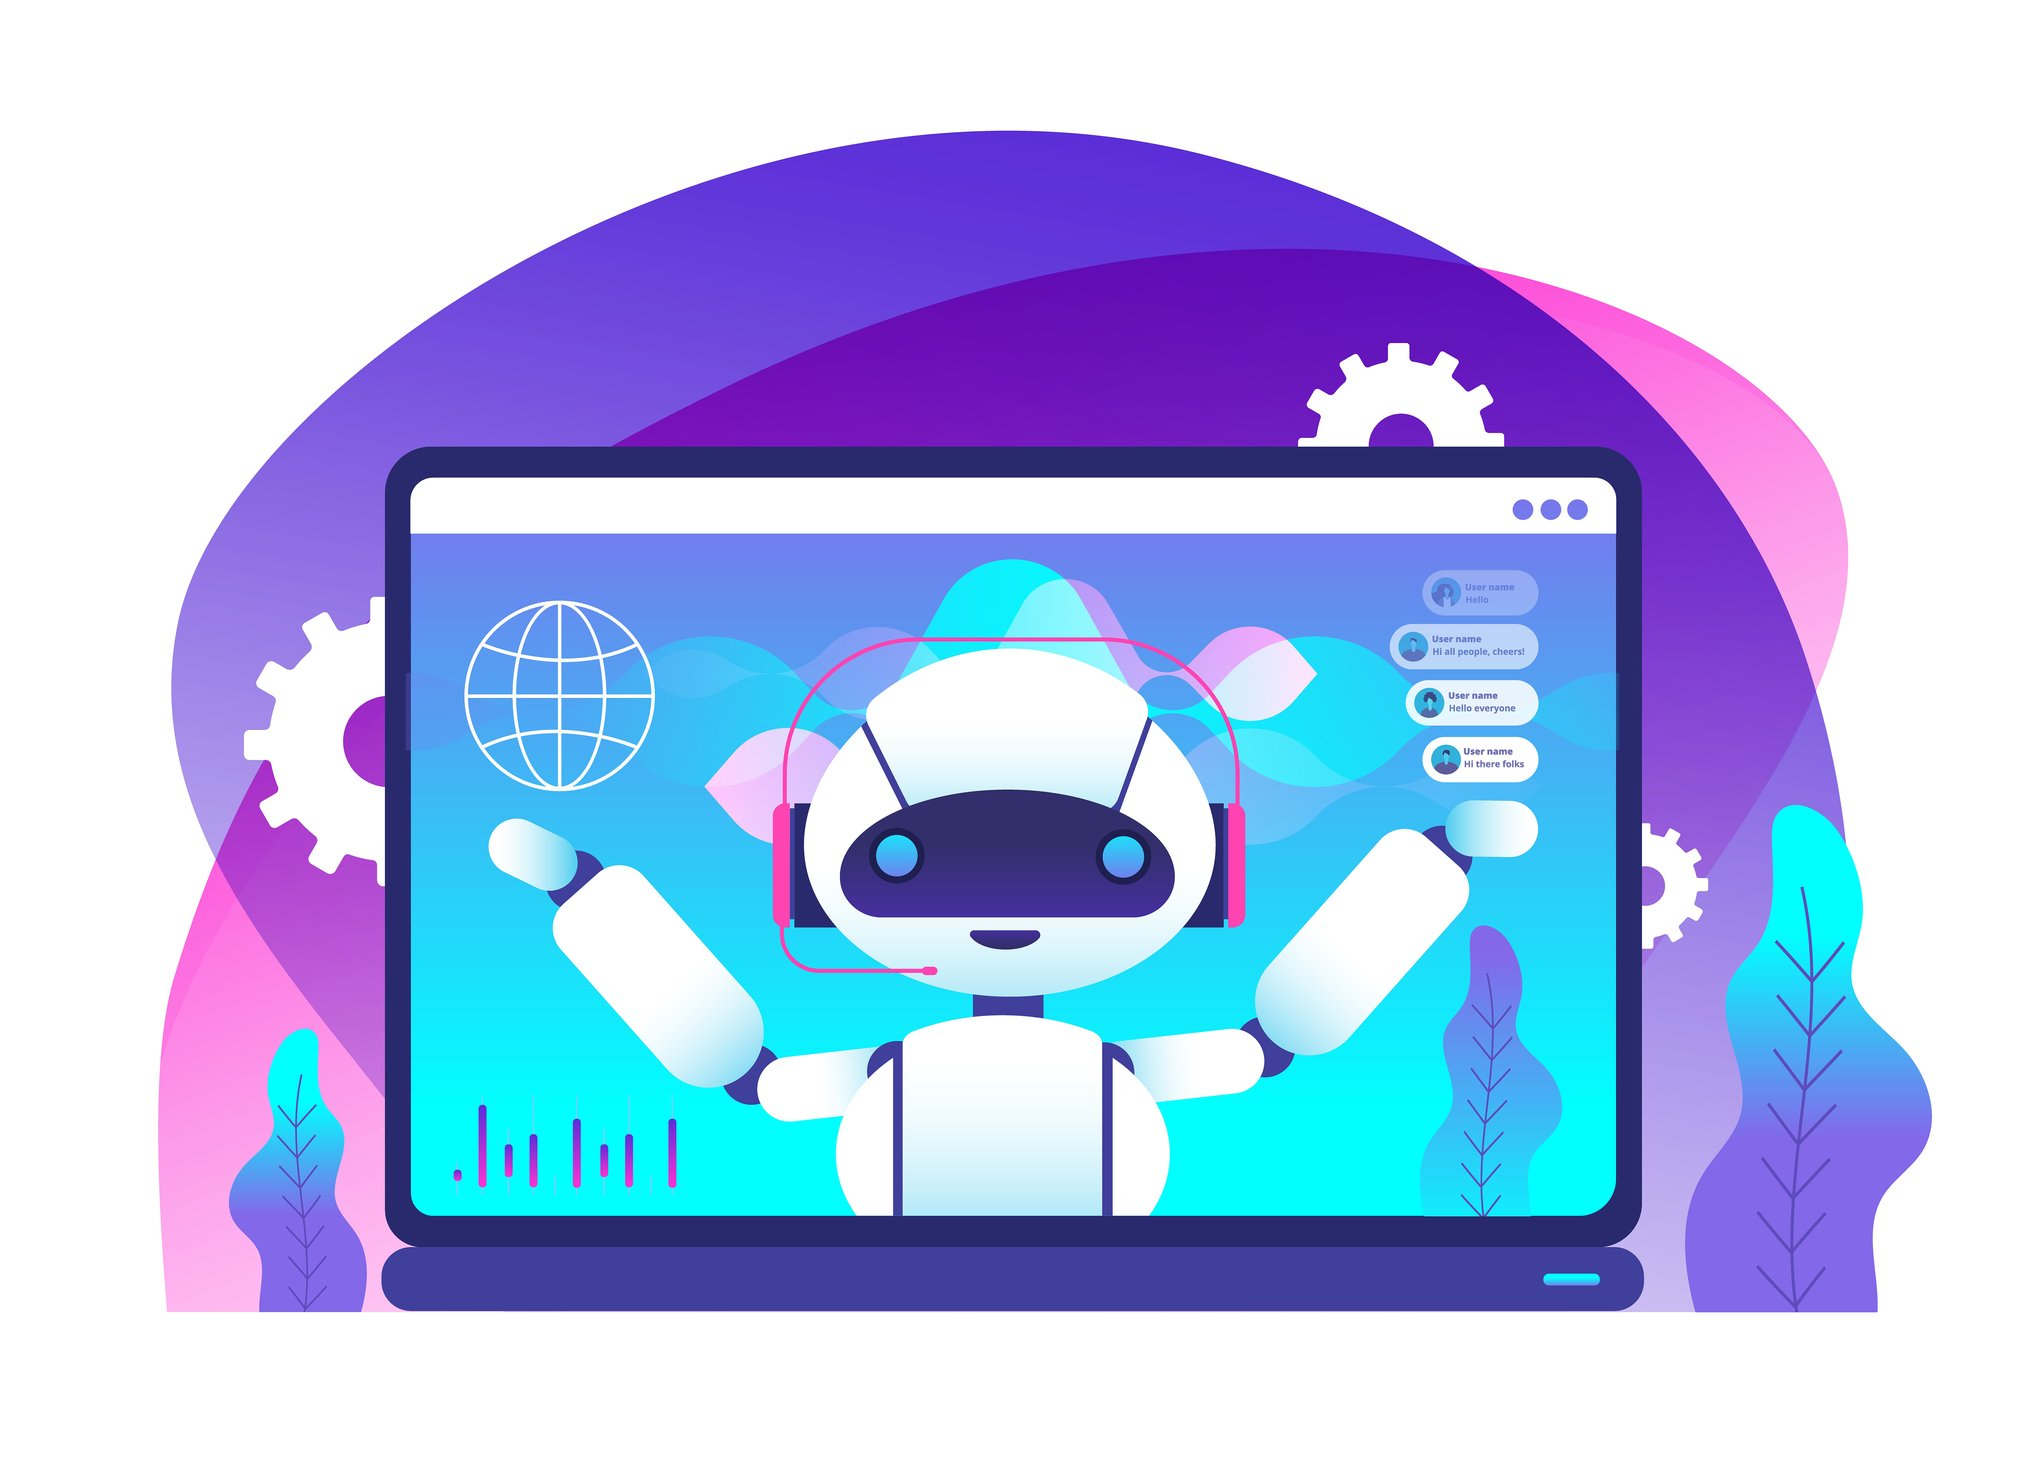 chatbot image AI Illustration 132610258 © Microvone